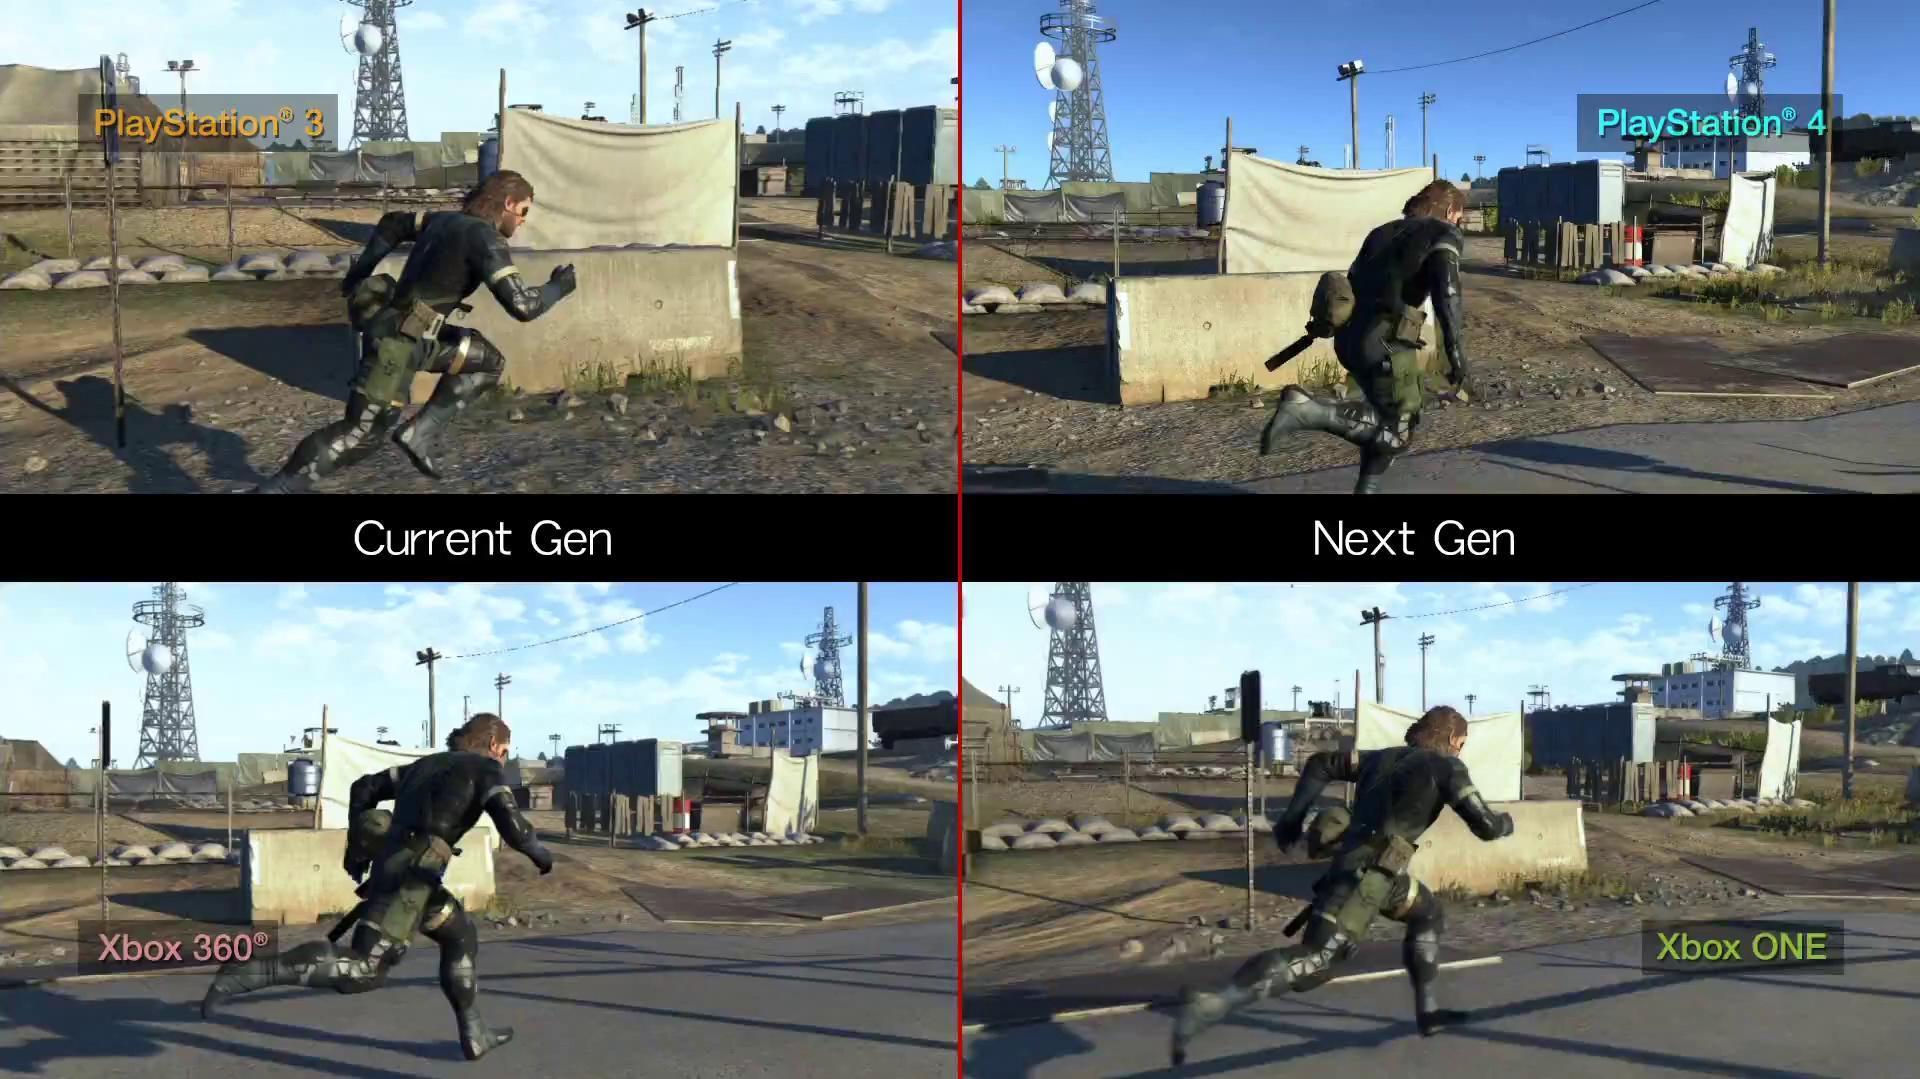 Metal Gear Solid V Ground Zeroes - Current Gen Next Gen comparisons HD